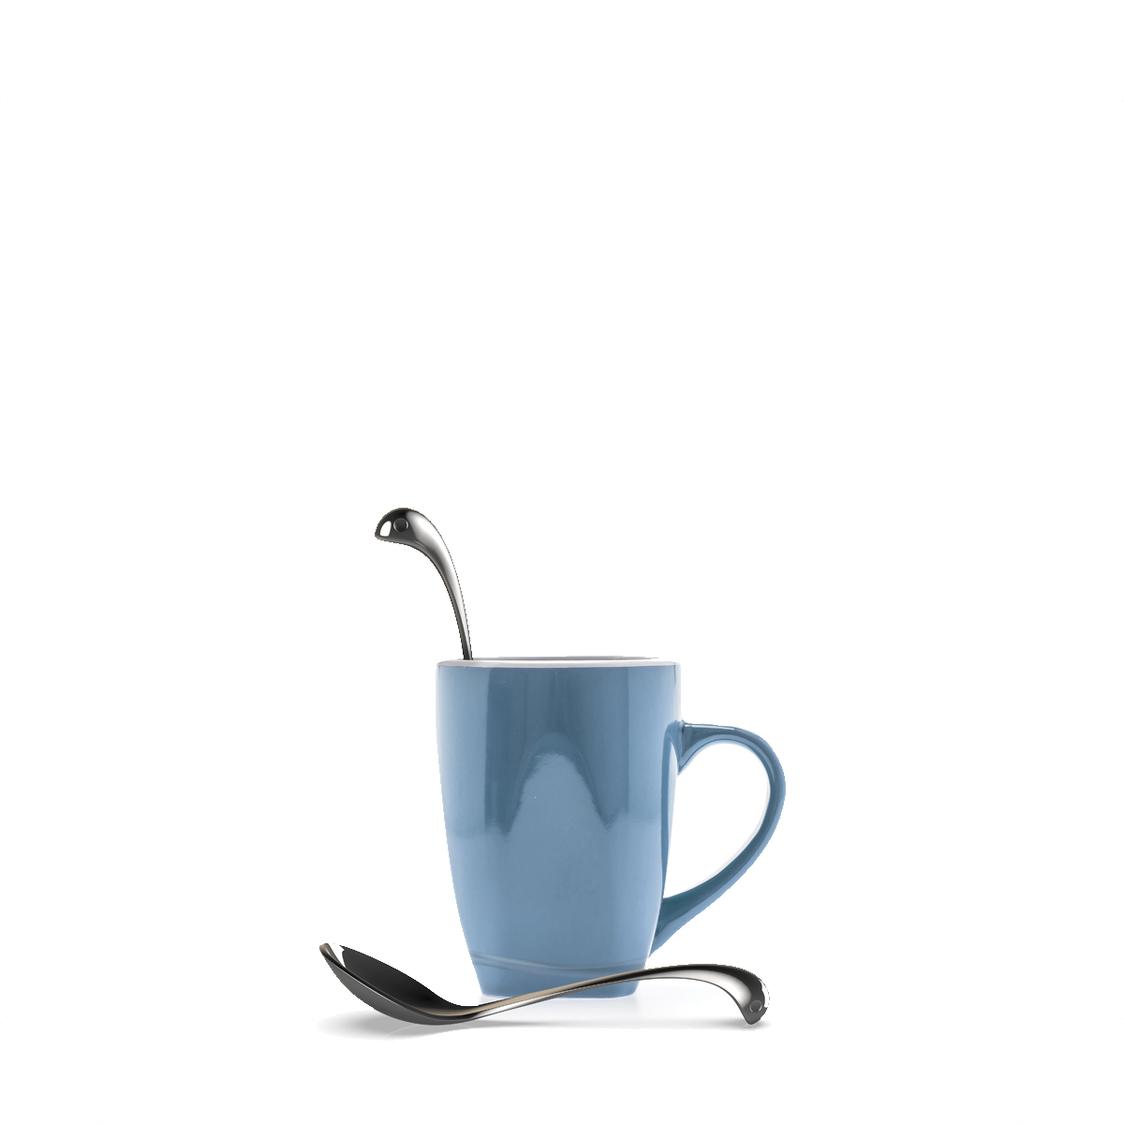 OTOTO Sweet Nessie Sugar Spoon